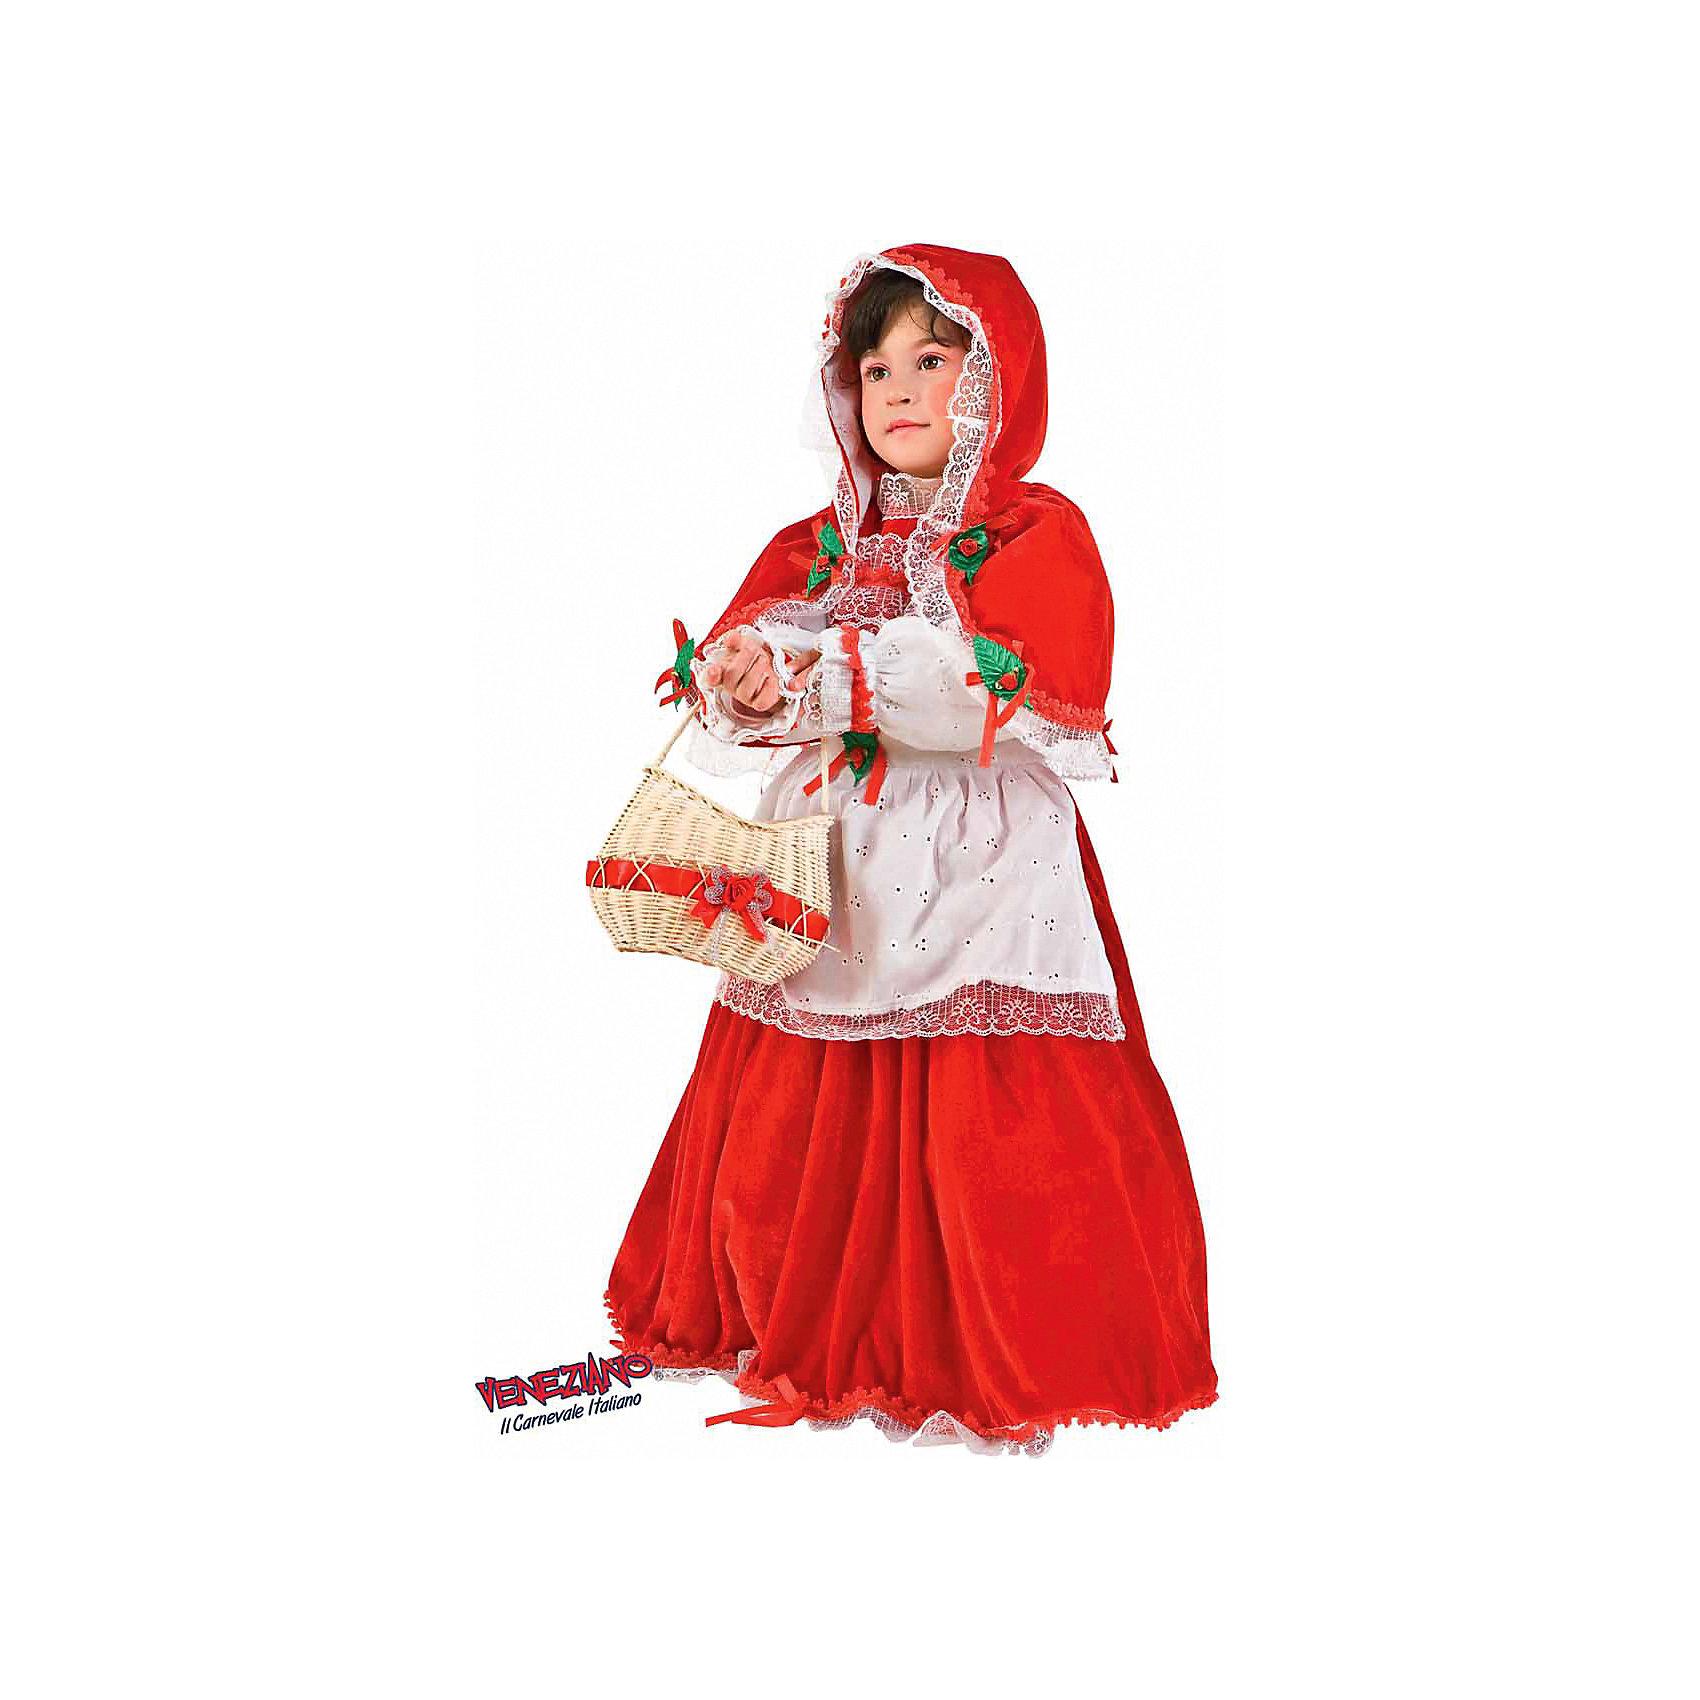 VENEZIANO Карнавальный костюм Красная шапочка, 2 года, Veneziano маргарет мур поцелуй виконта